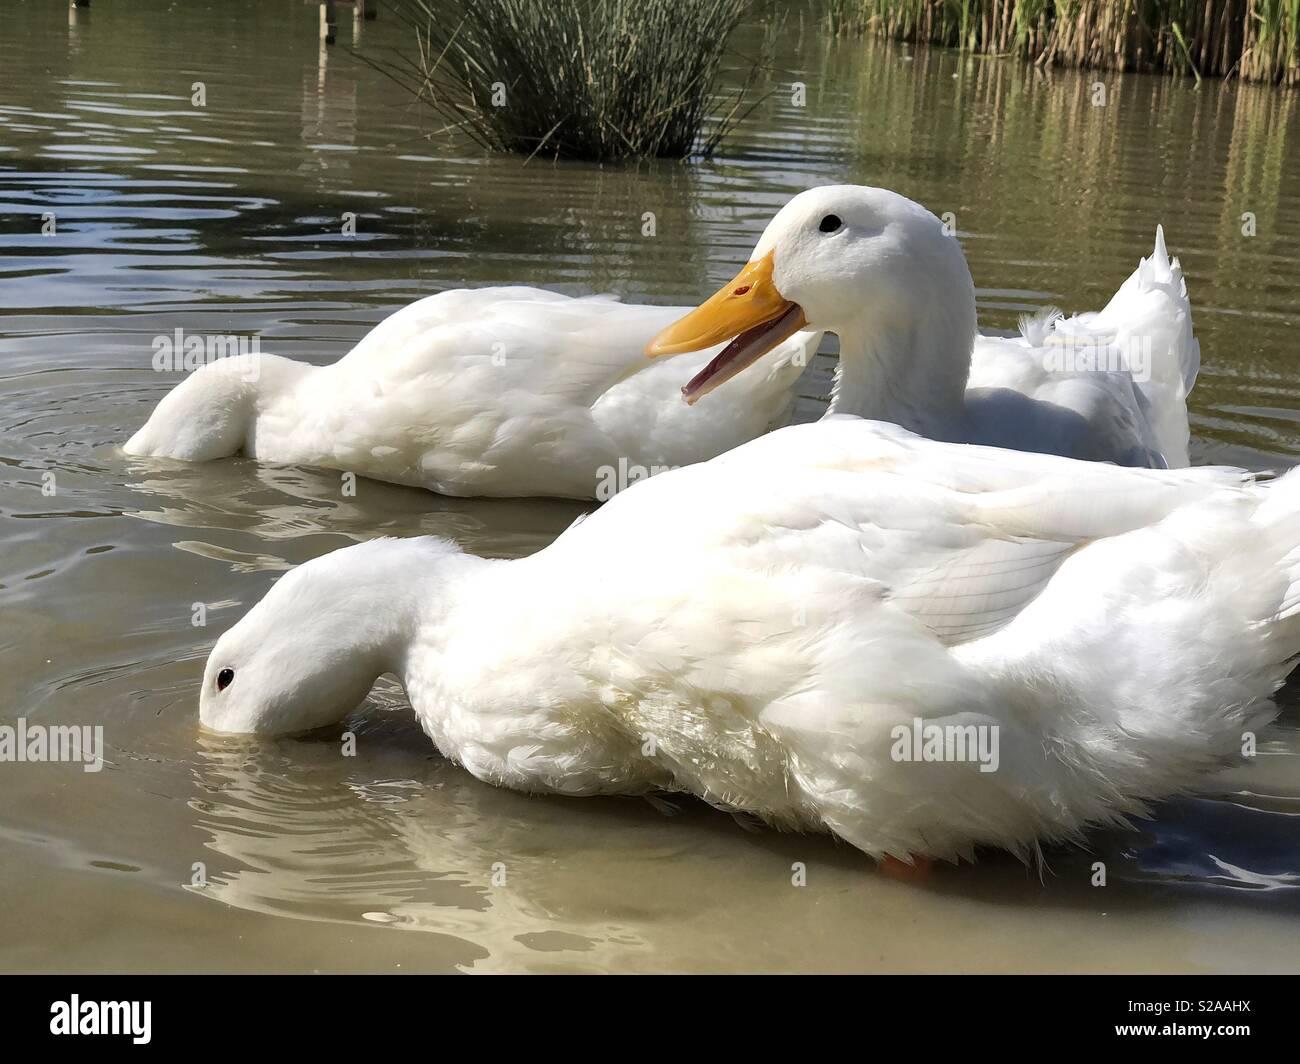 Quacking pekin duck and friends - Stock Image